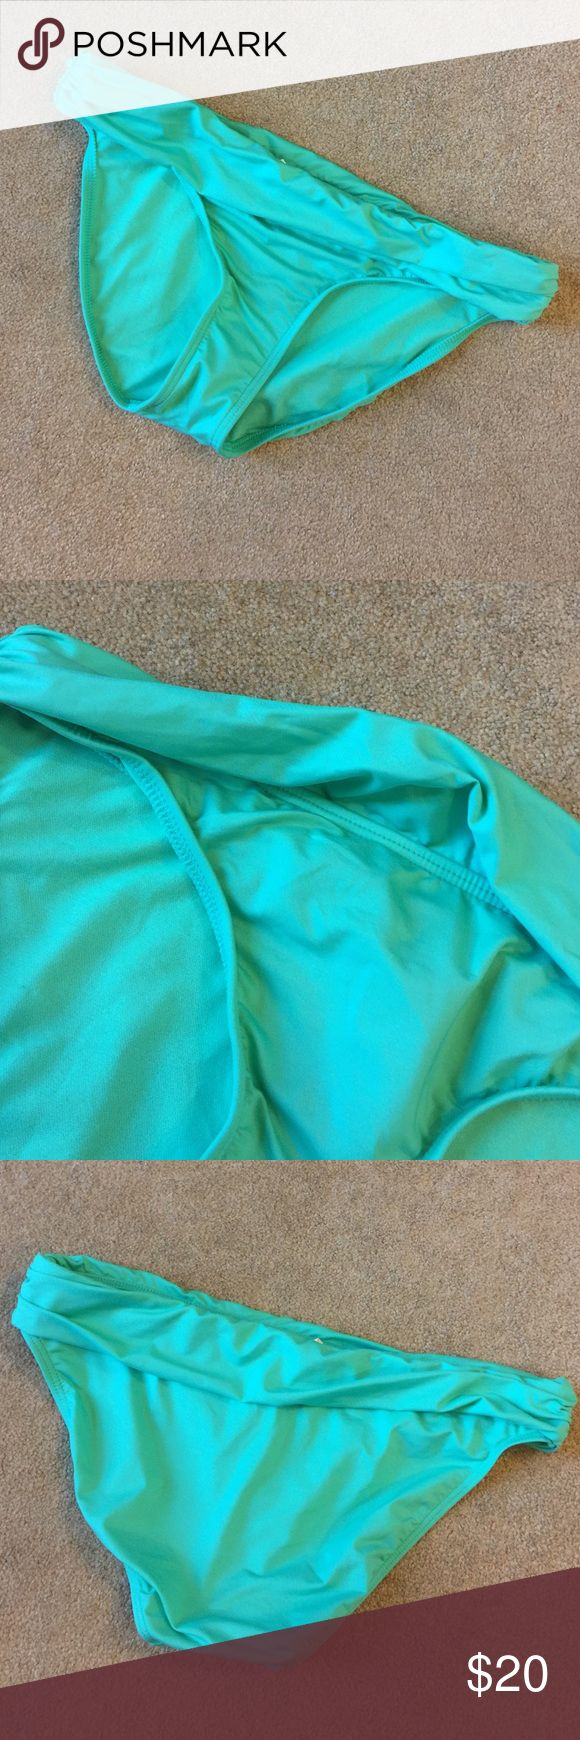 Mint Green Bikini Bottoms. Nwt Roll down waistband. Kenneth Cole Reaction Swim Bikinis